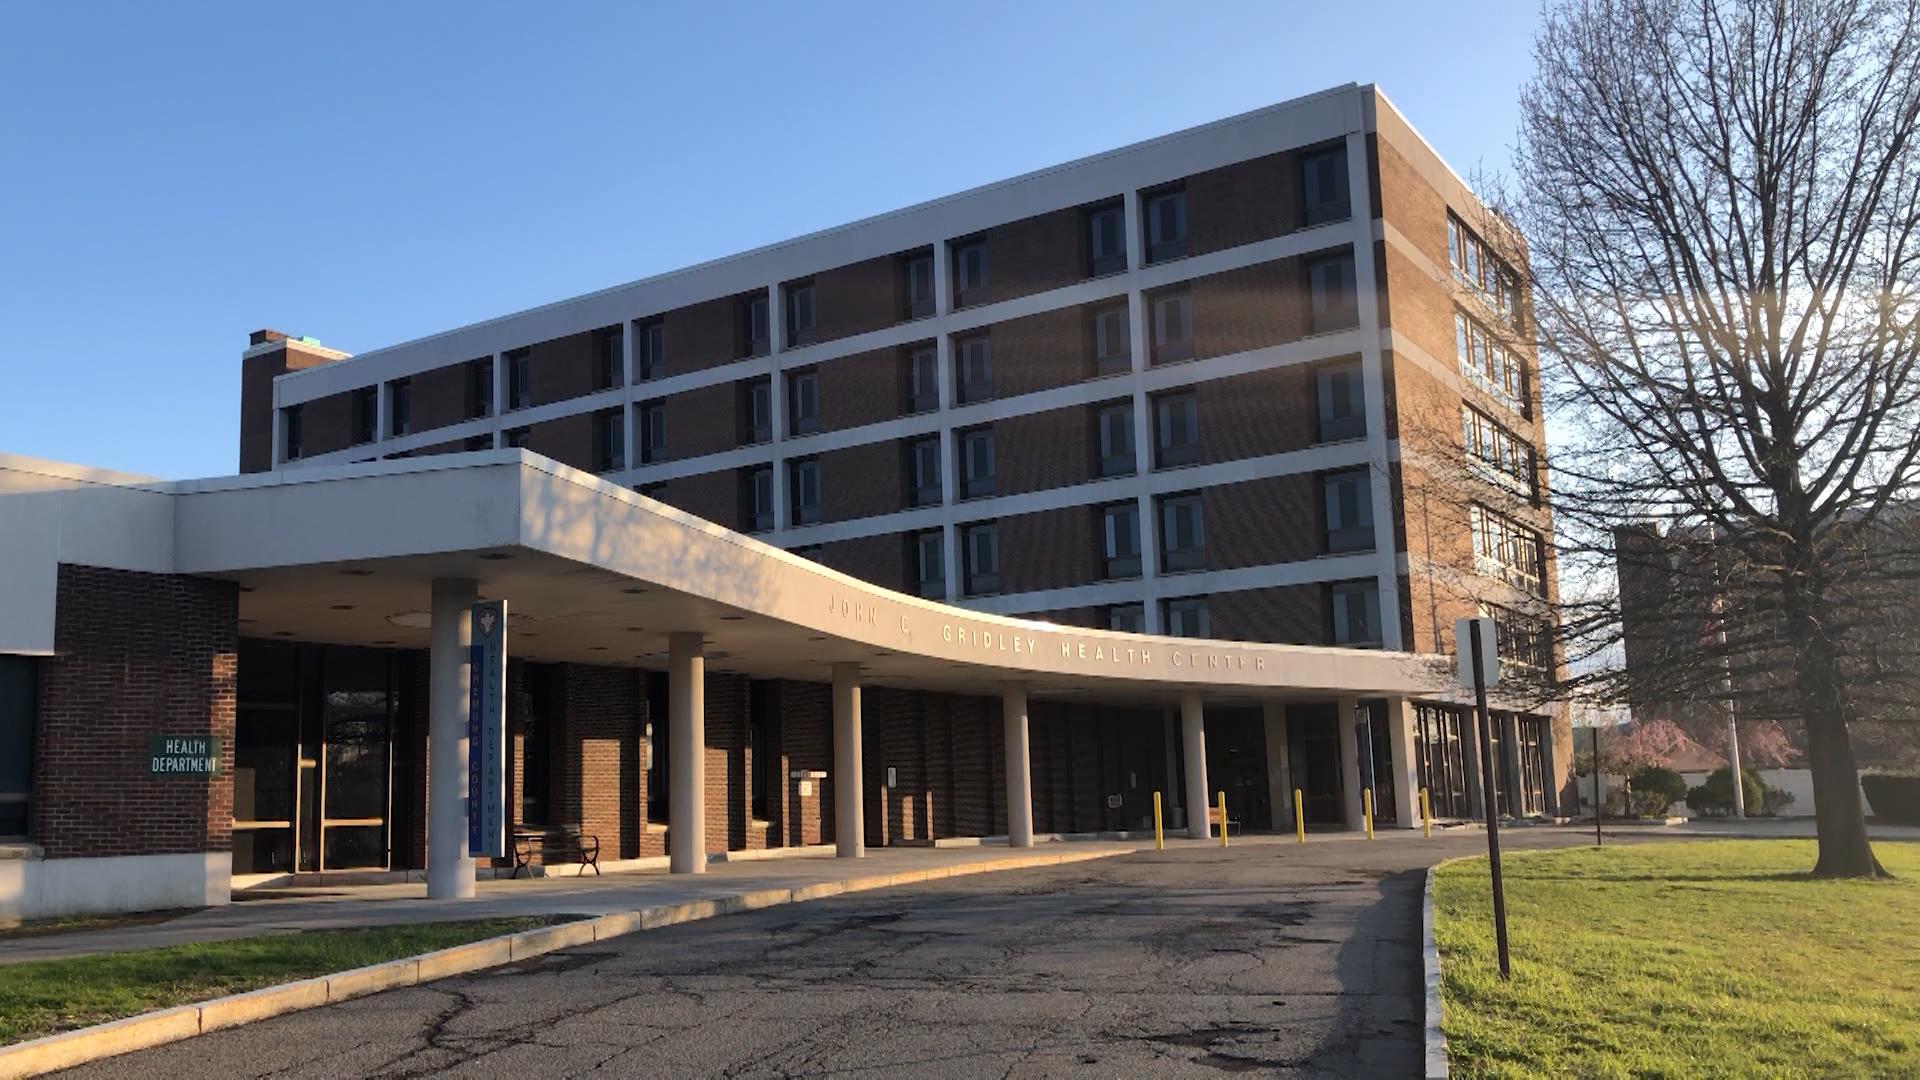 Chemung County Nursing Facility